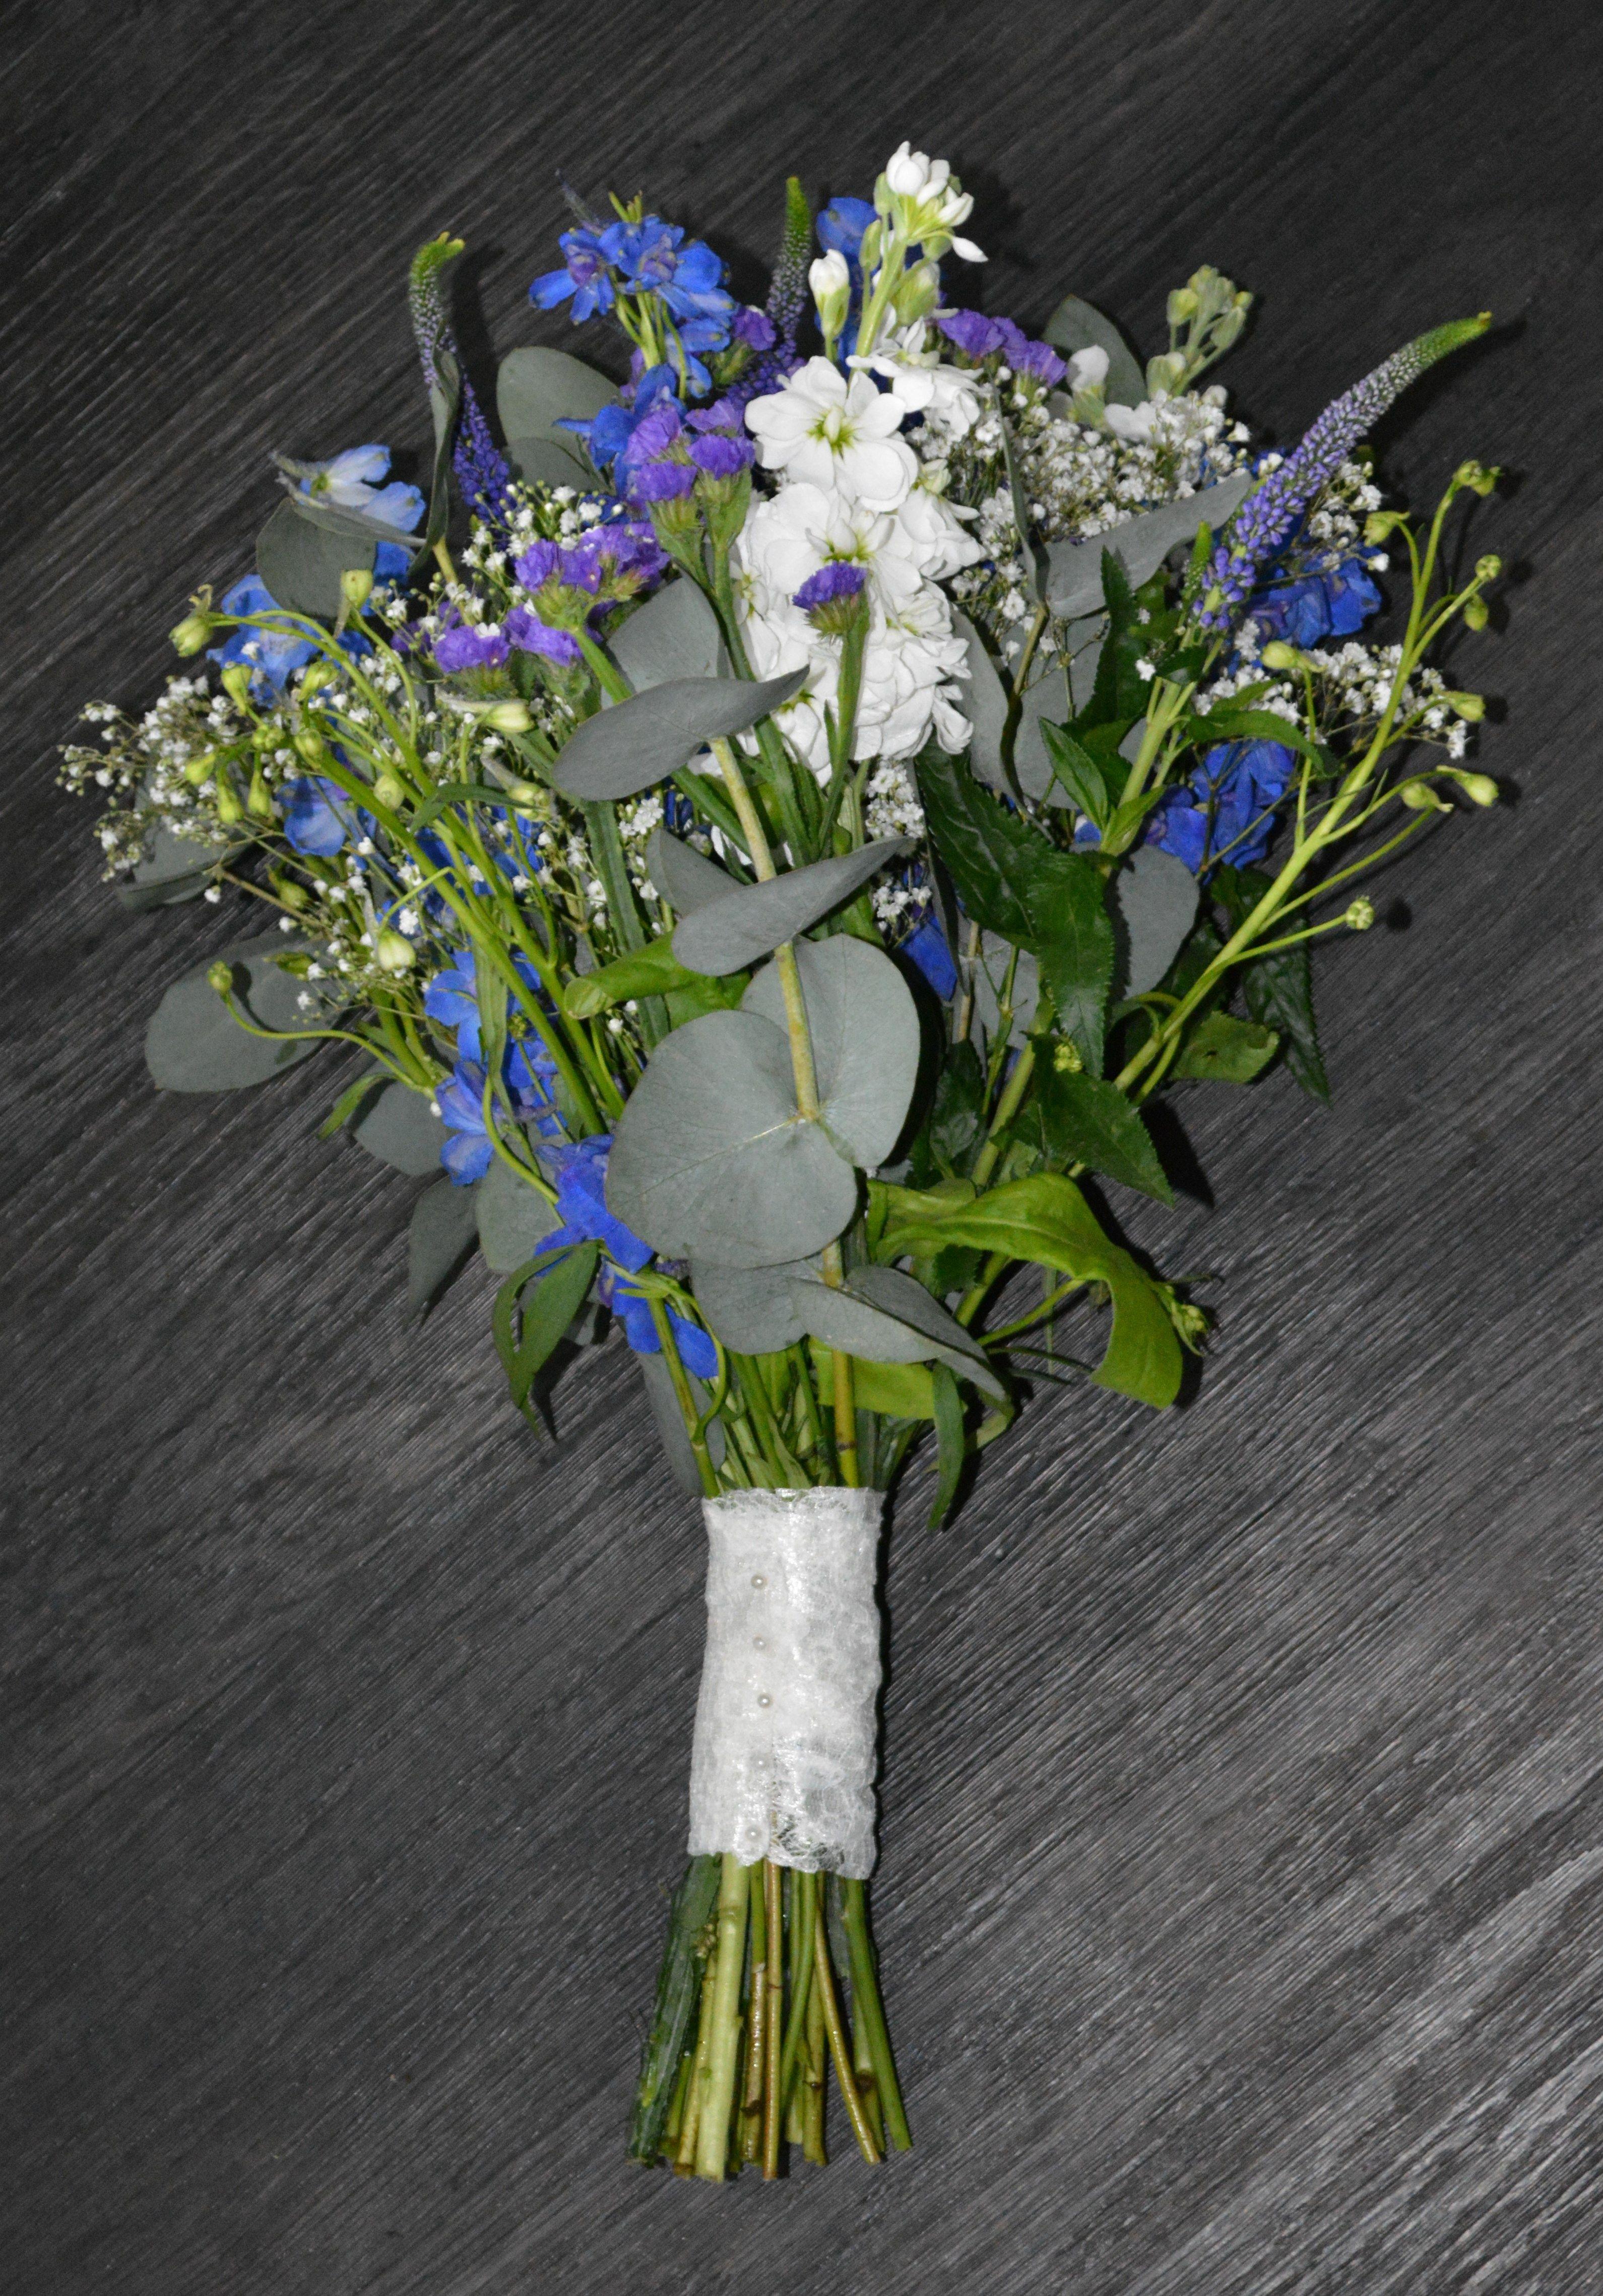 Wild Bouquet Including Delphinium Stocks Veronica Gypsophila